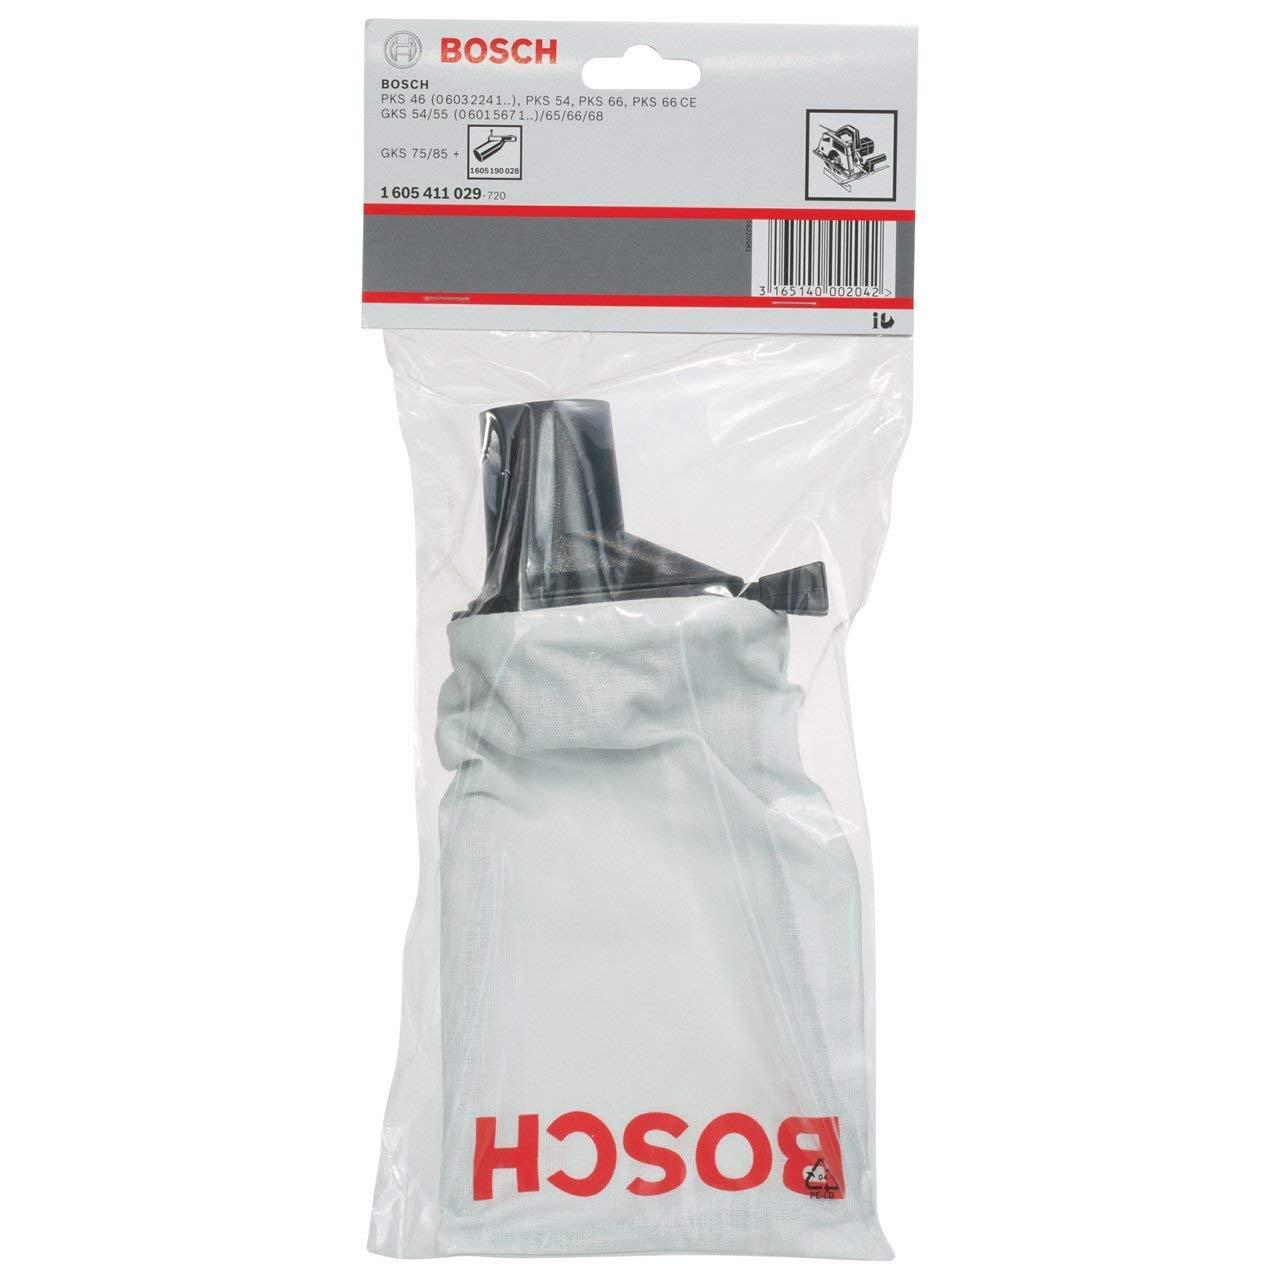 Bosch Professional GKS 190 - Sierra circular, 1400 W, disco 190 mm, en caja + Bosch 2 607 001 375 - Adaptador - - (pack de 1)